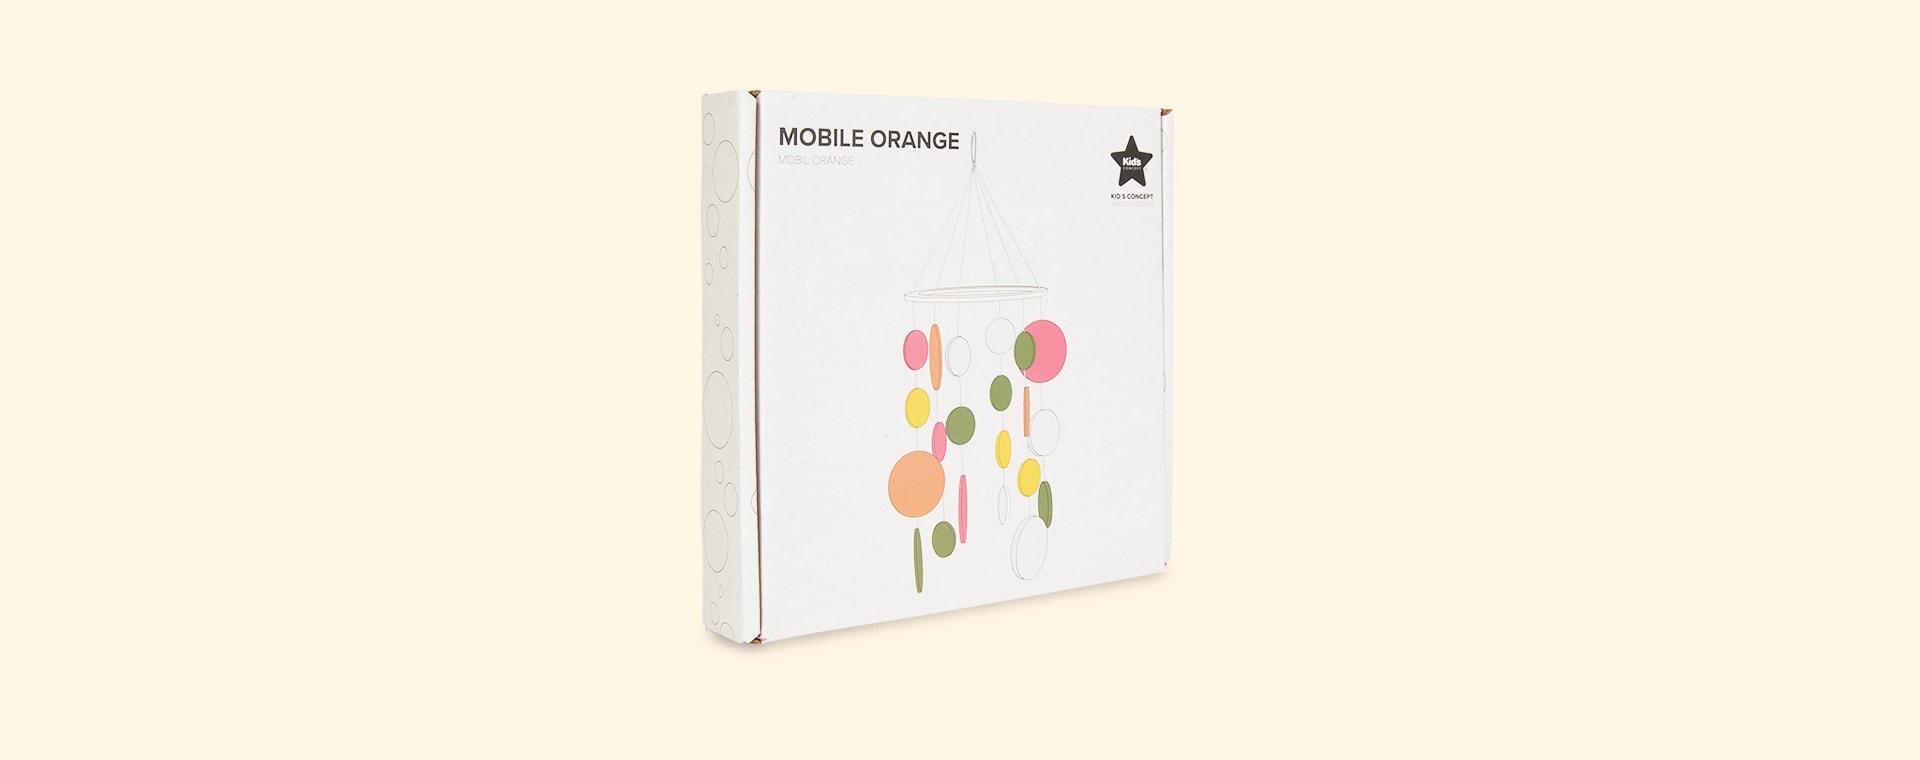 Orange Kid's Concept Mobile